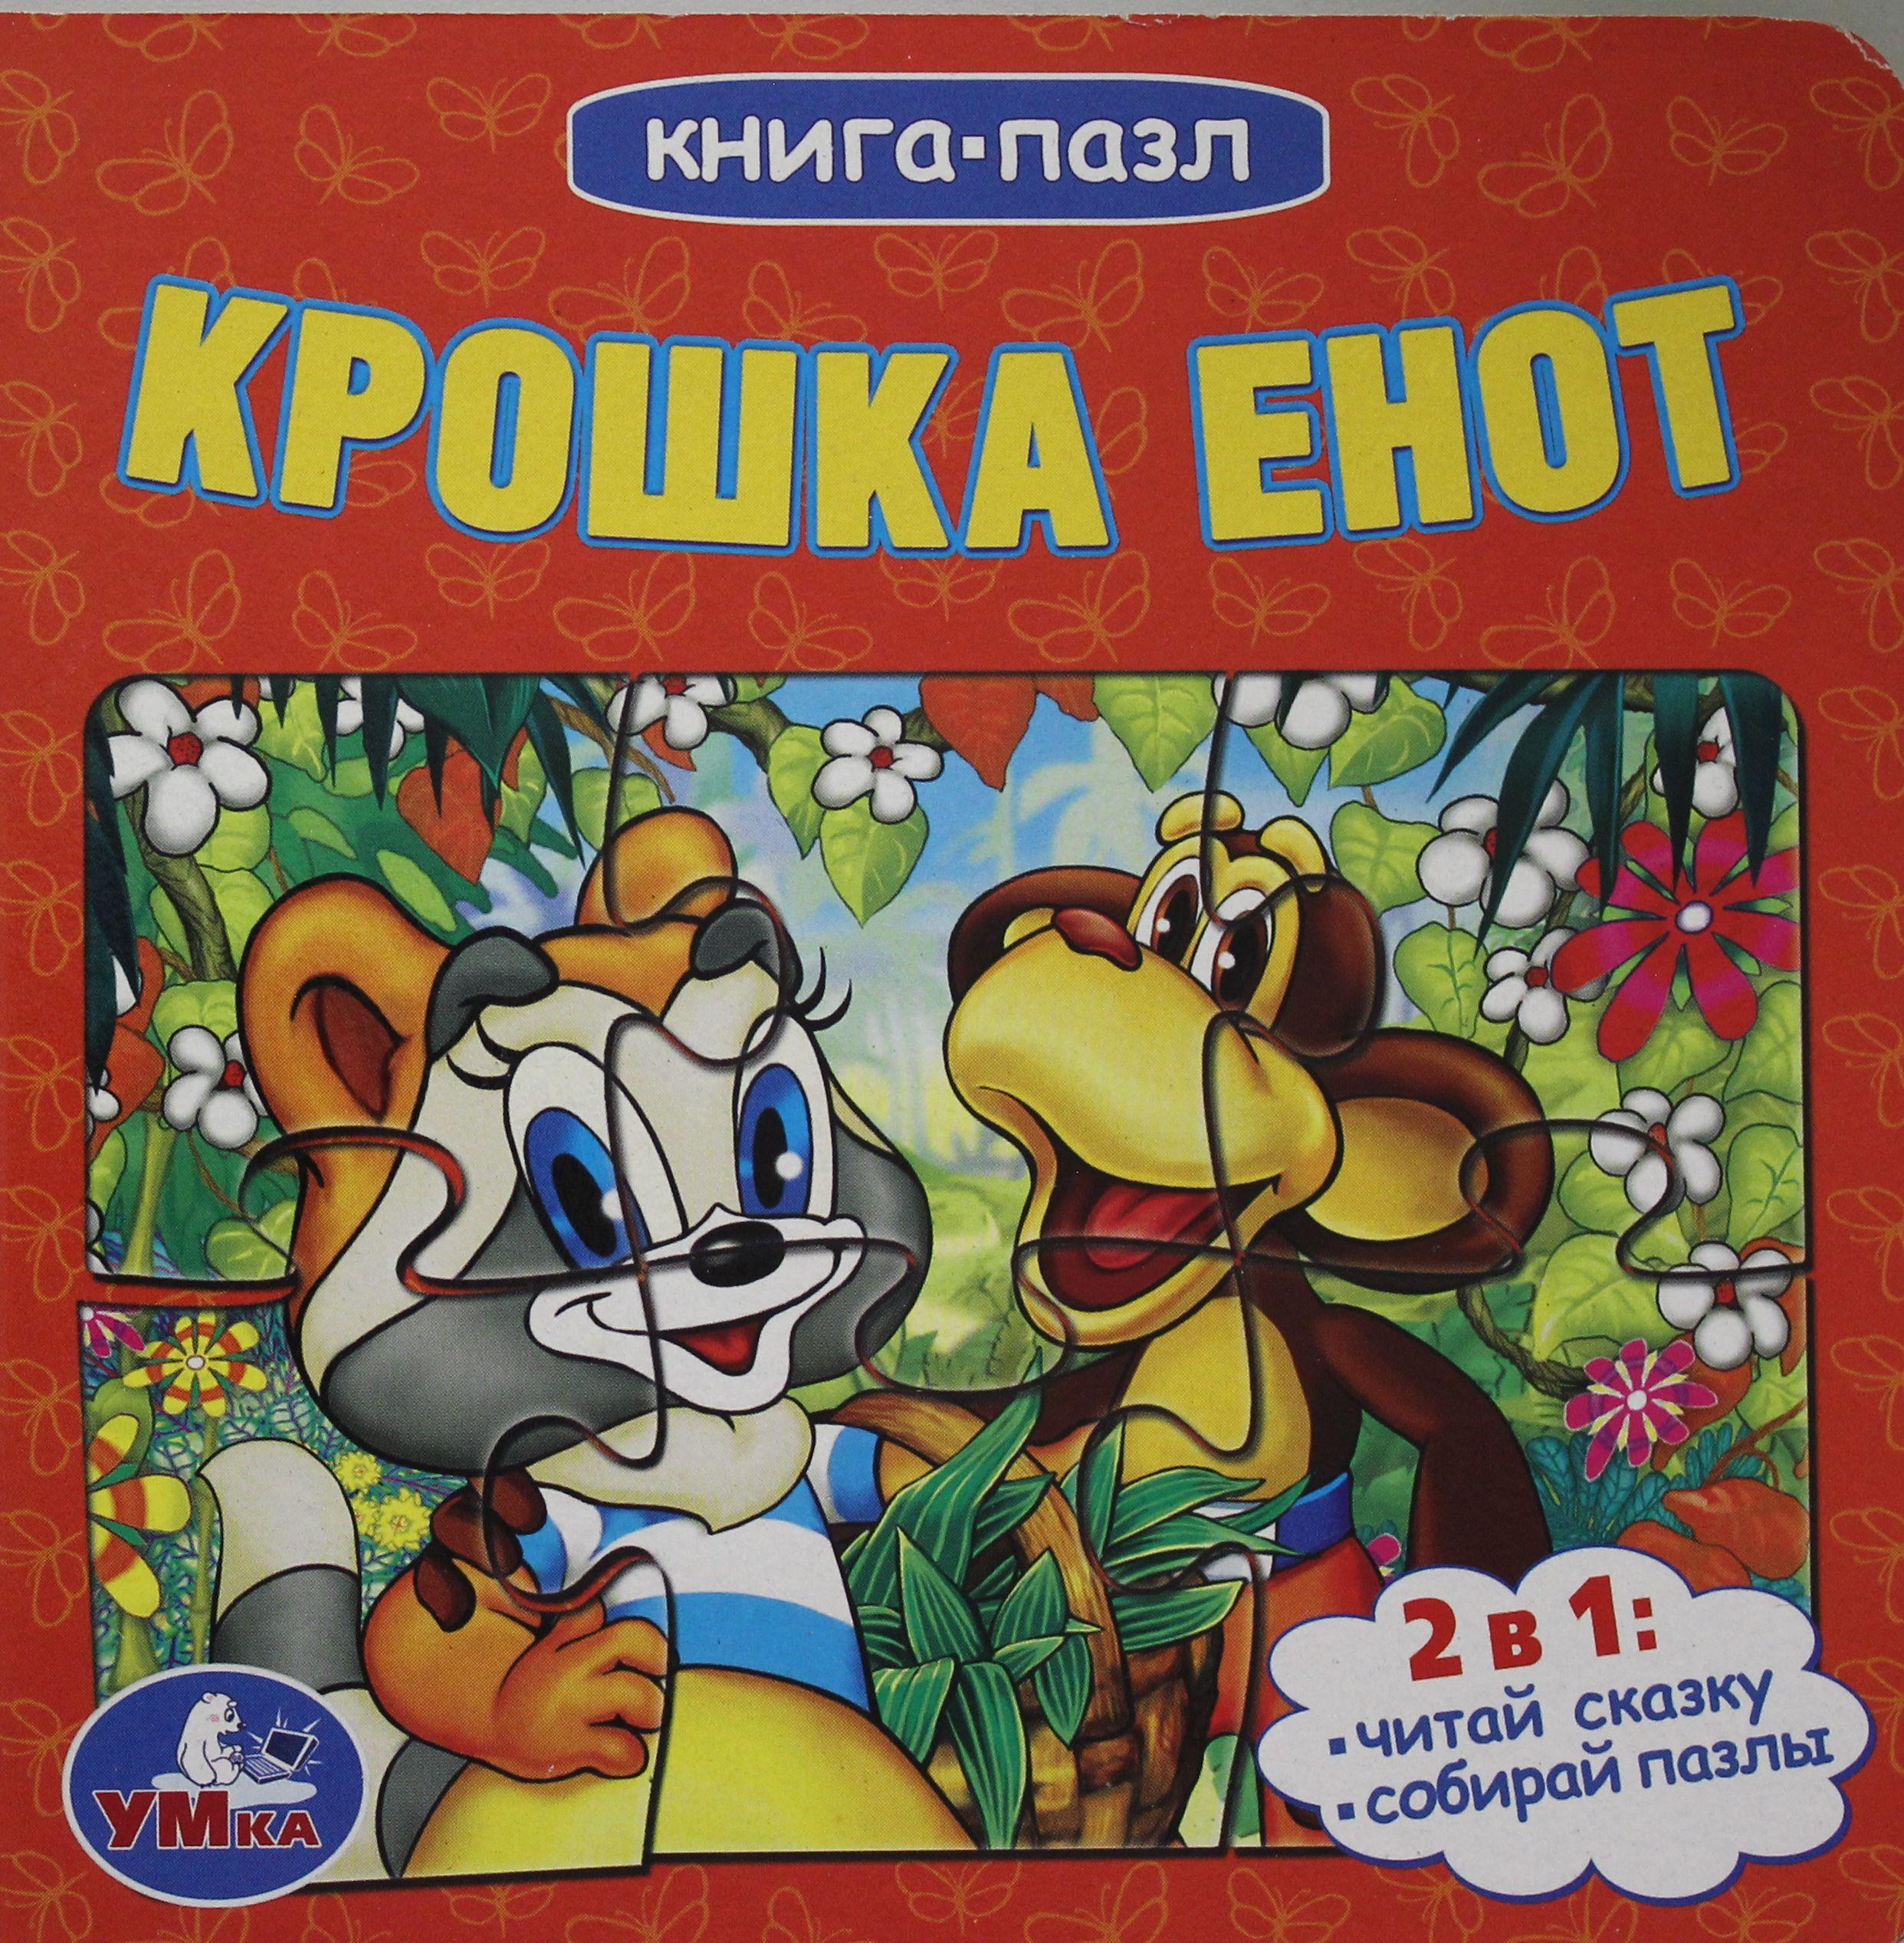 KROSHKA ENOT